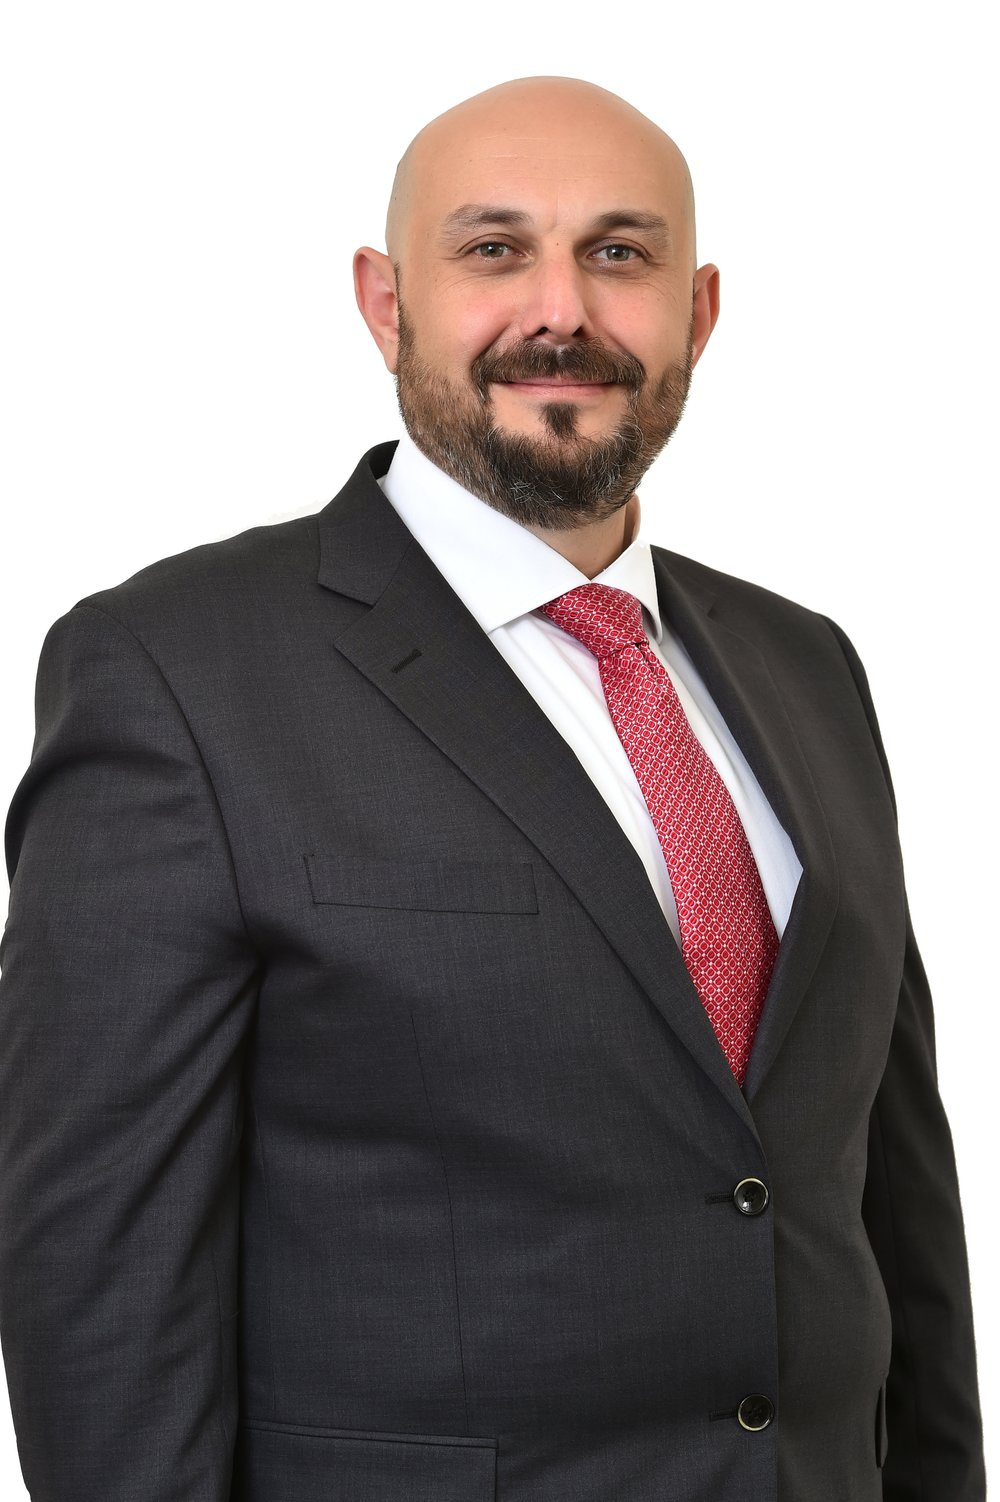 Eddy Abou Chakra BSMP CISA CEC KPIP®PuMPFounder & Managing Partner -